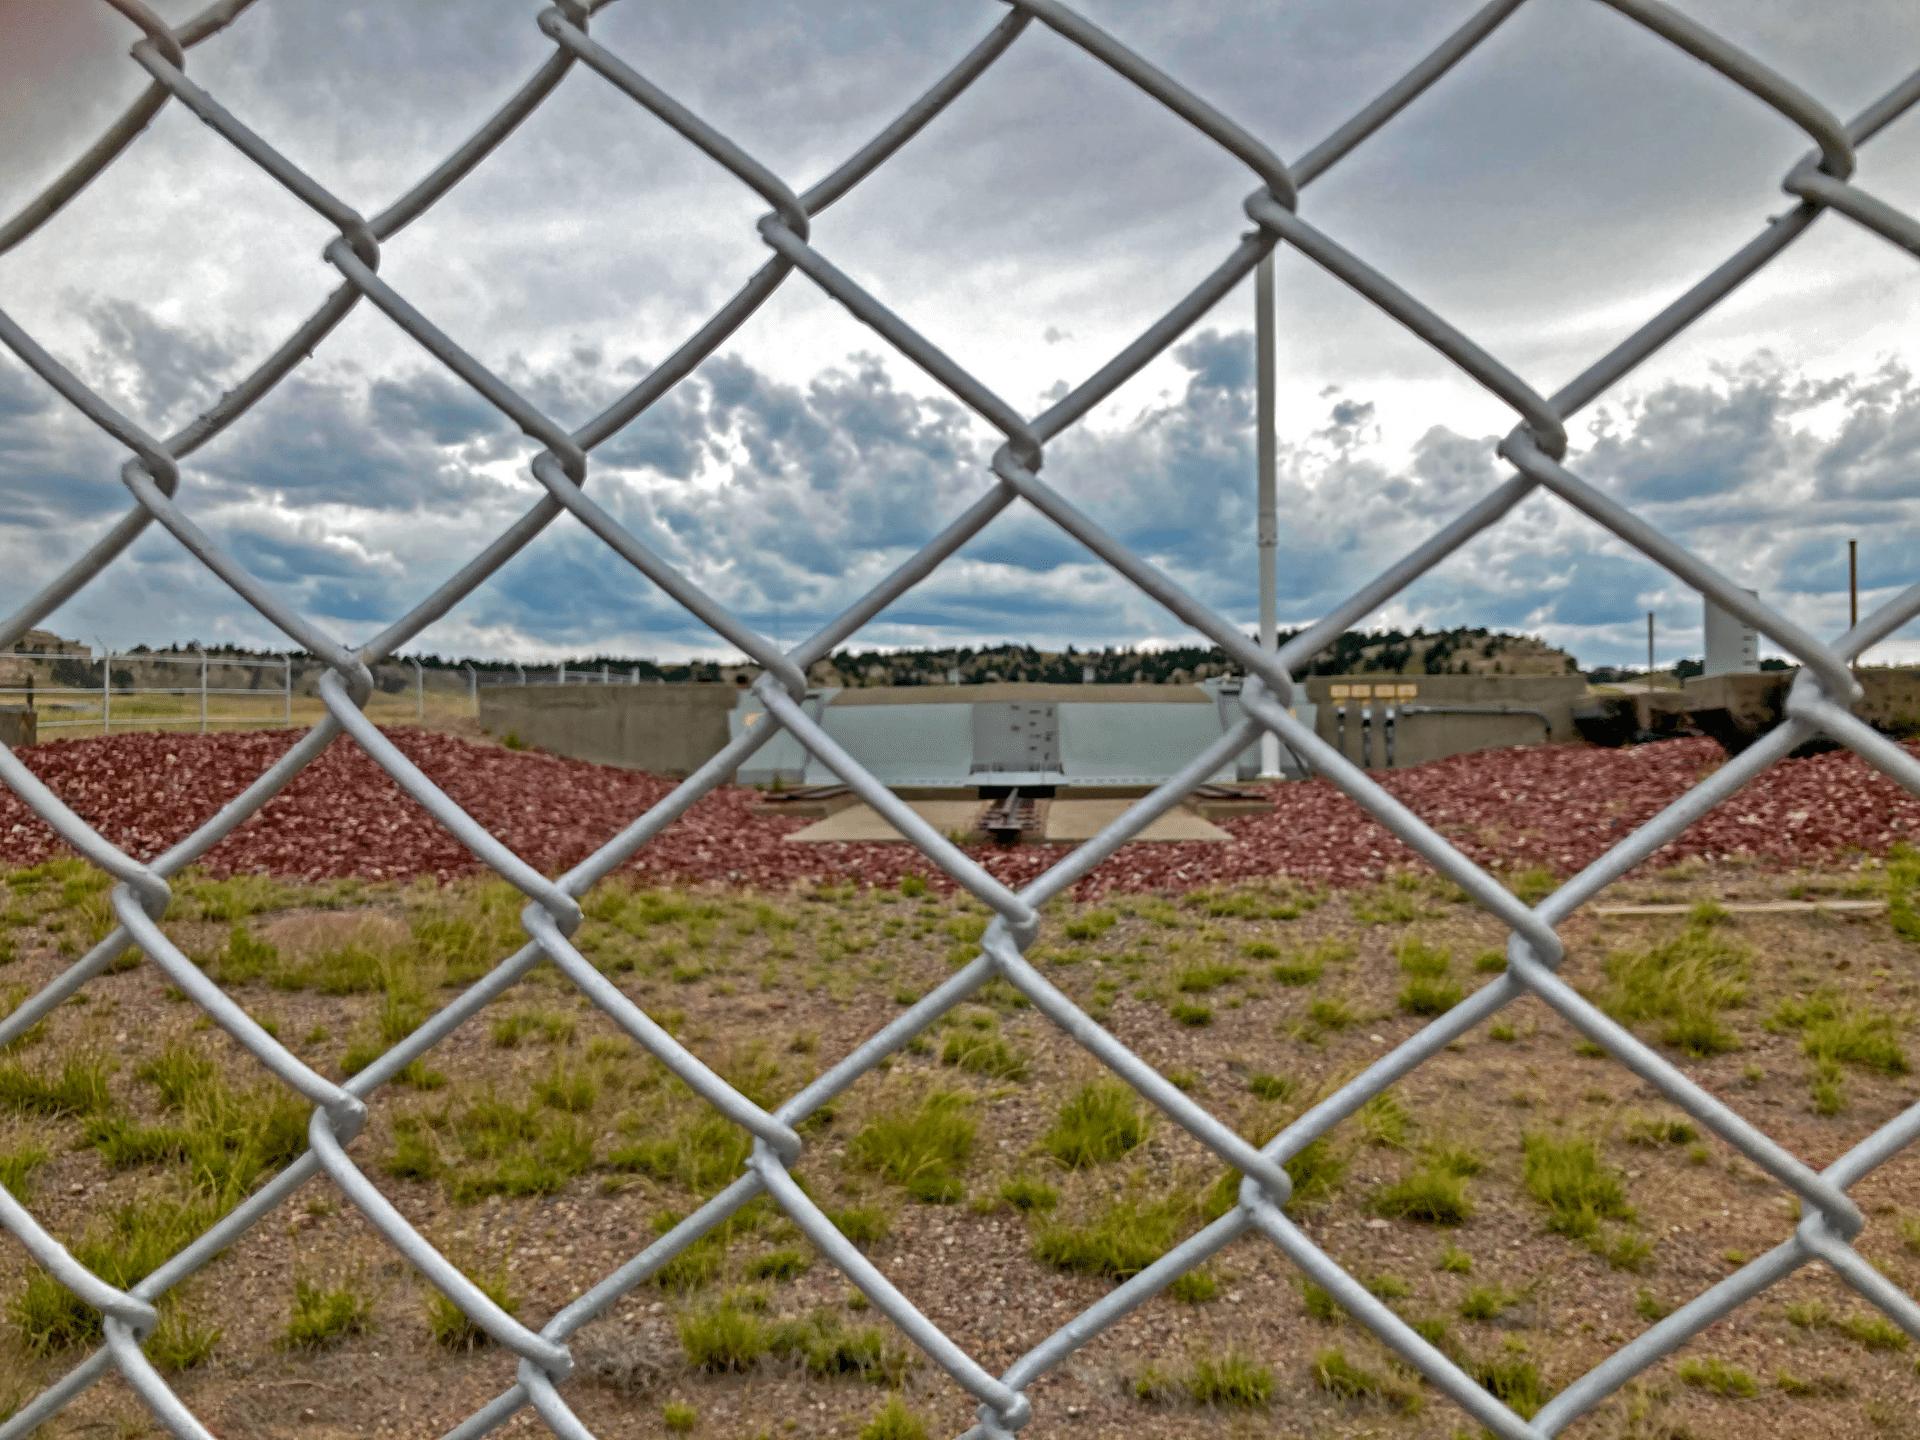 c-2-silo-fence